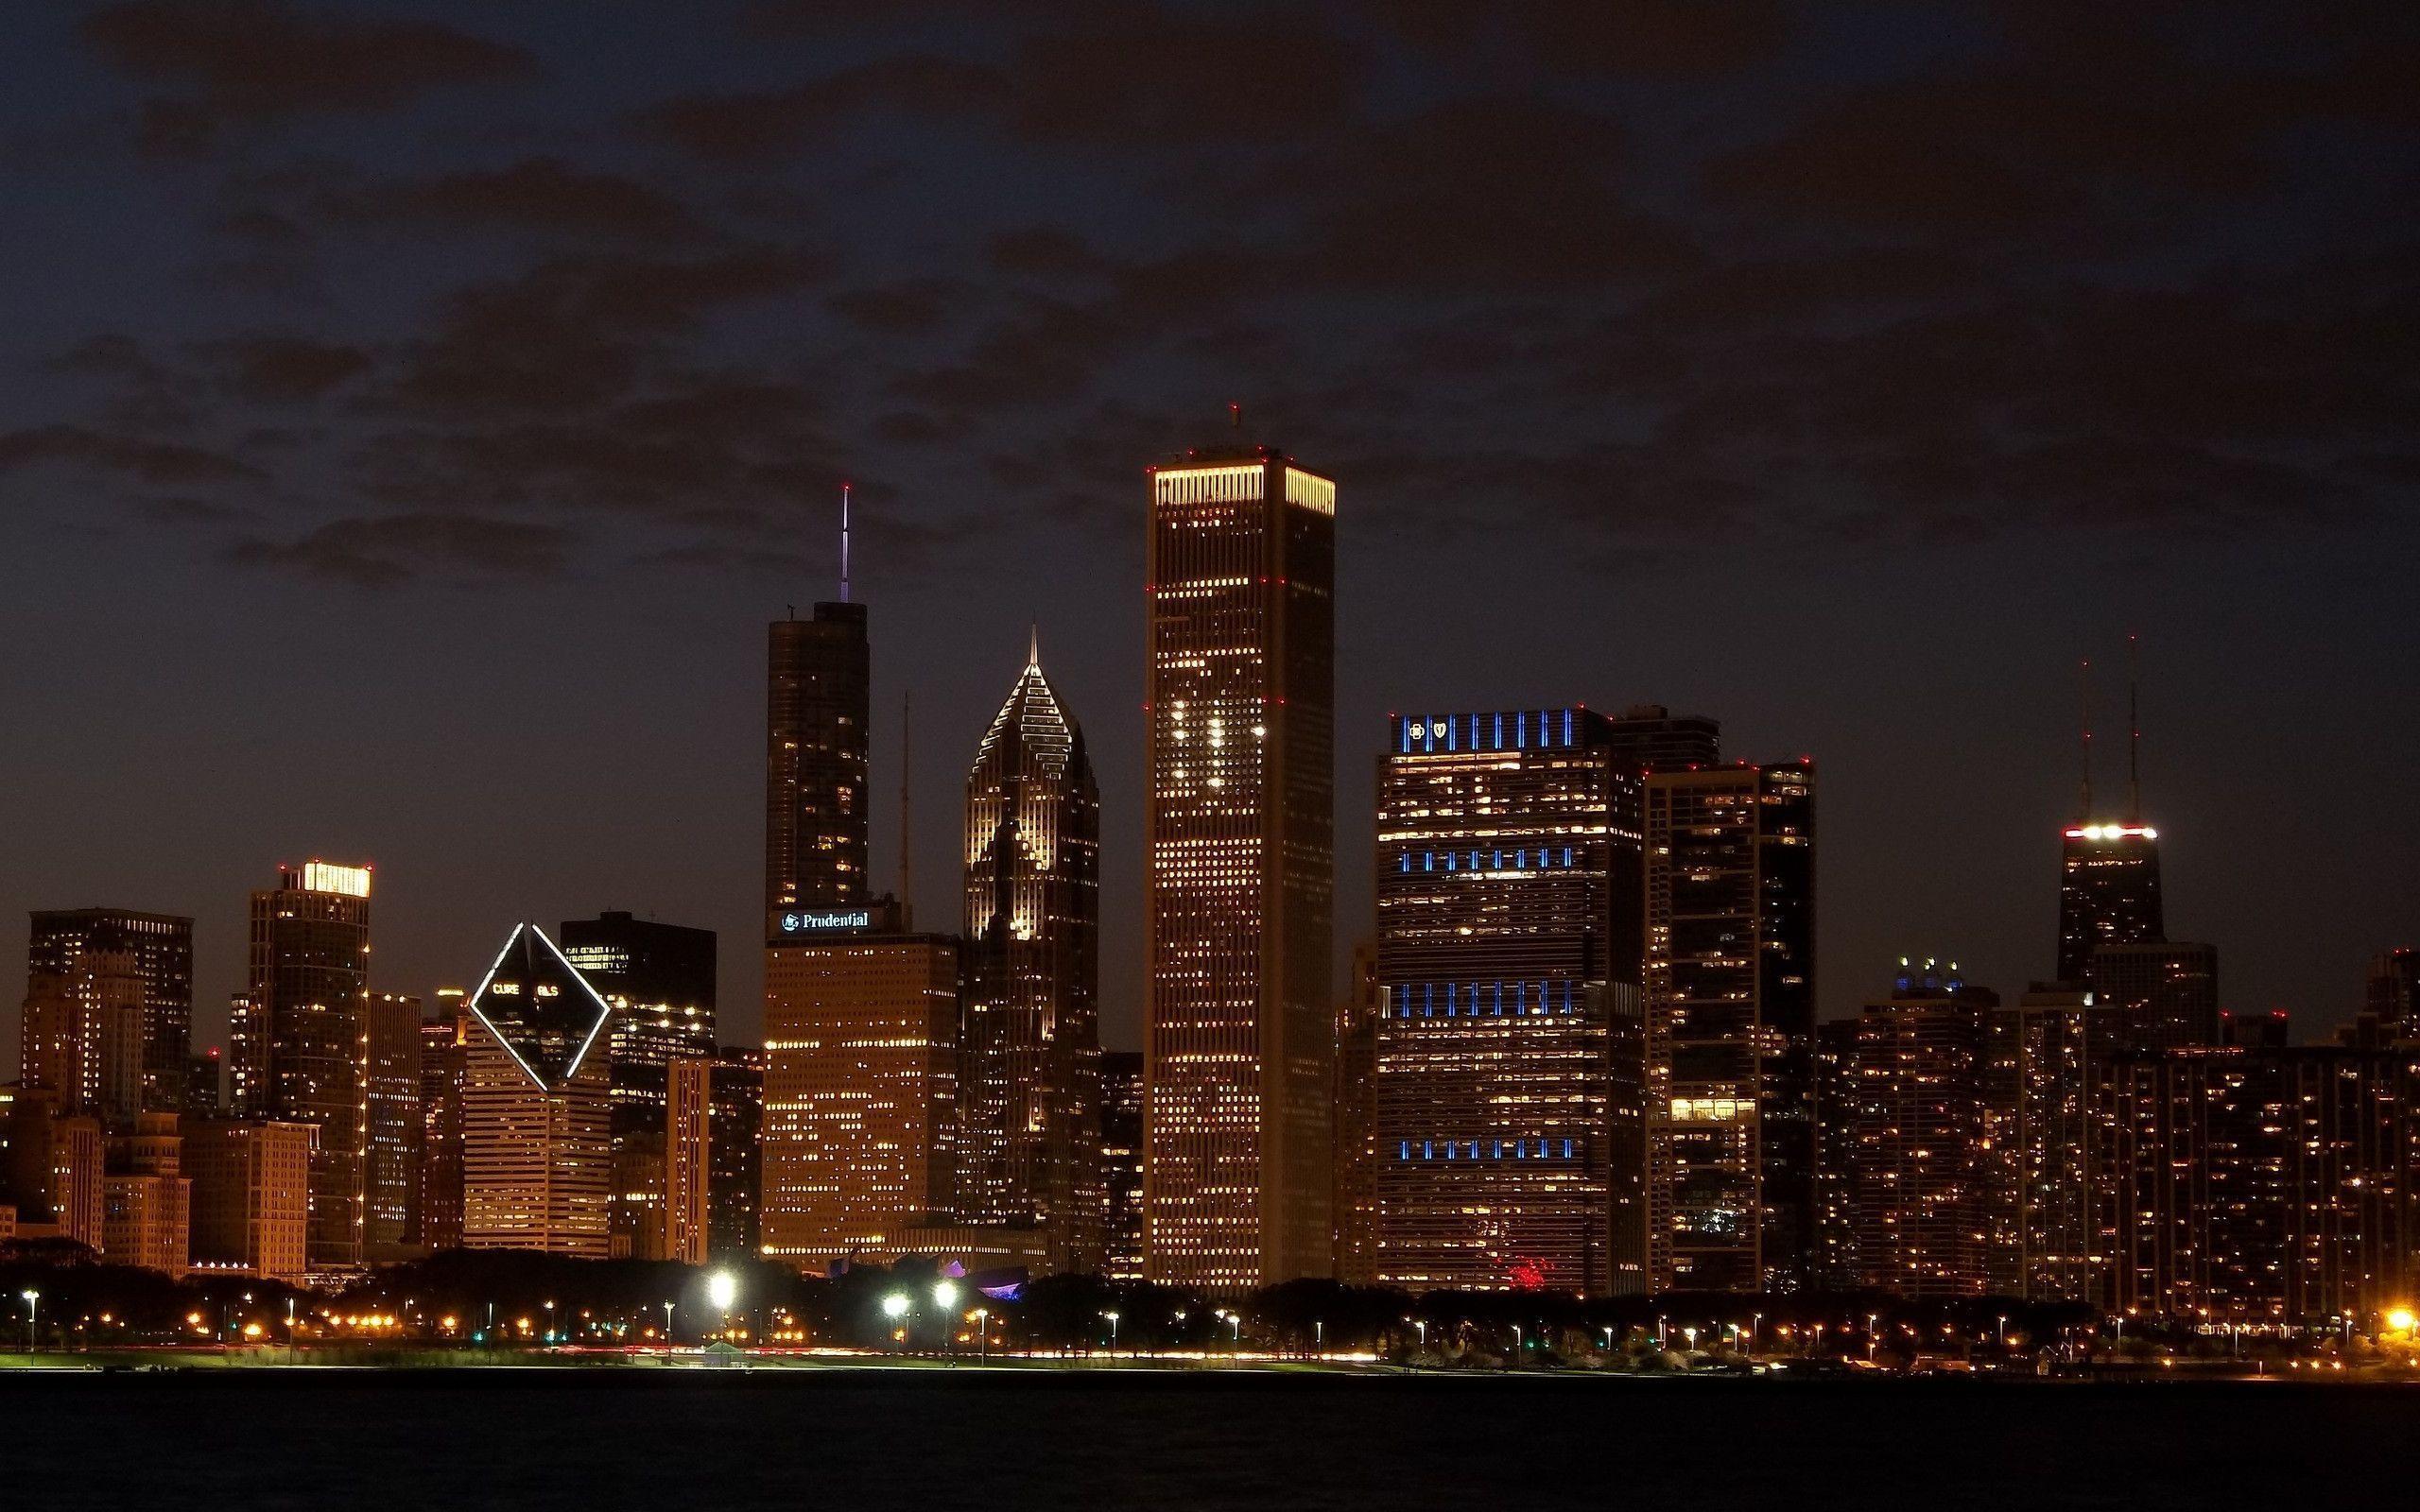 chicago night skyline wallpaper - photo #23